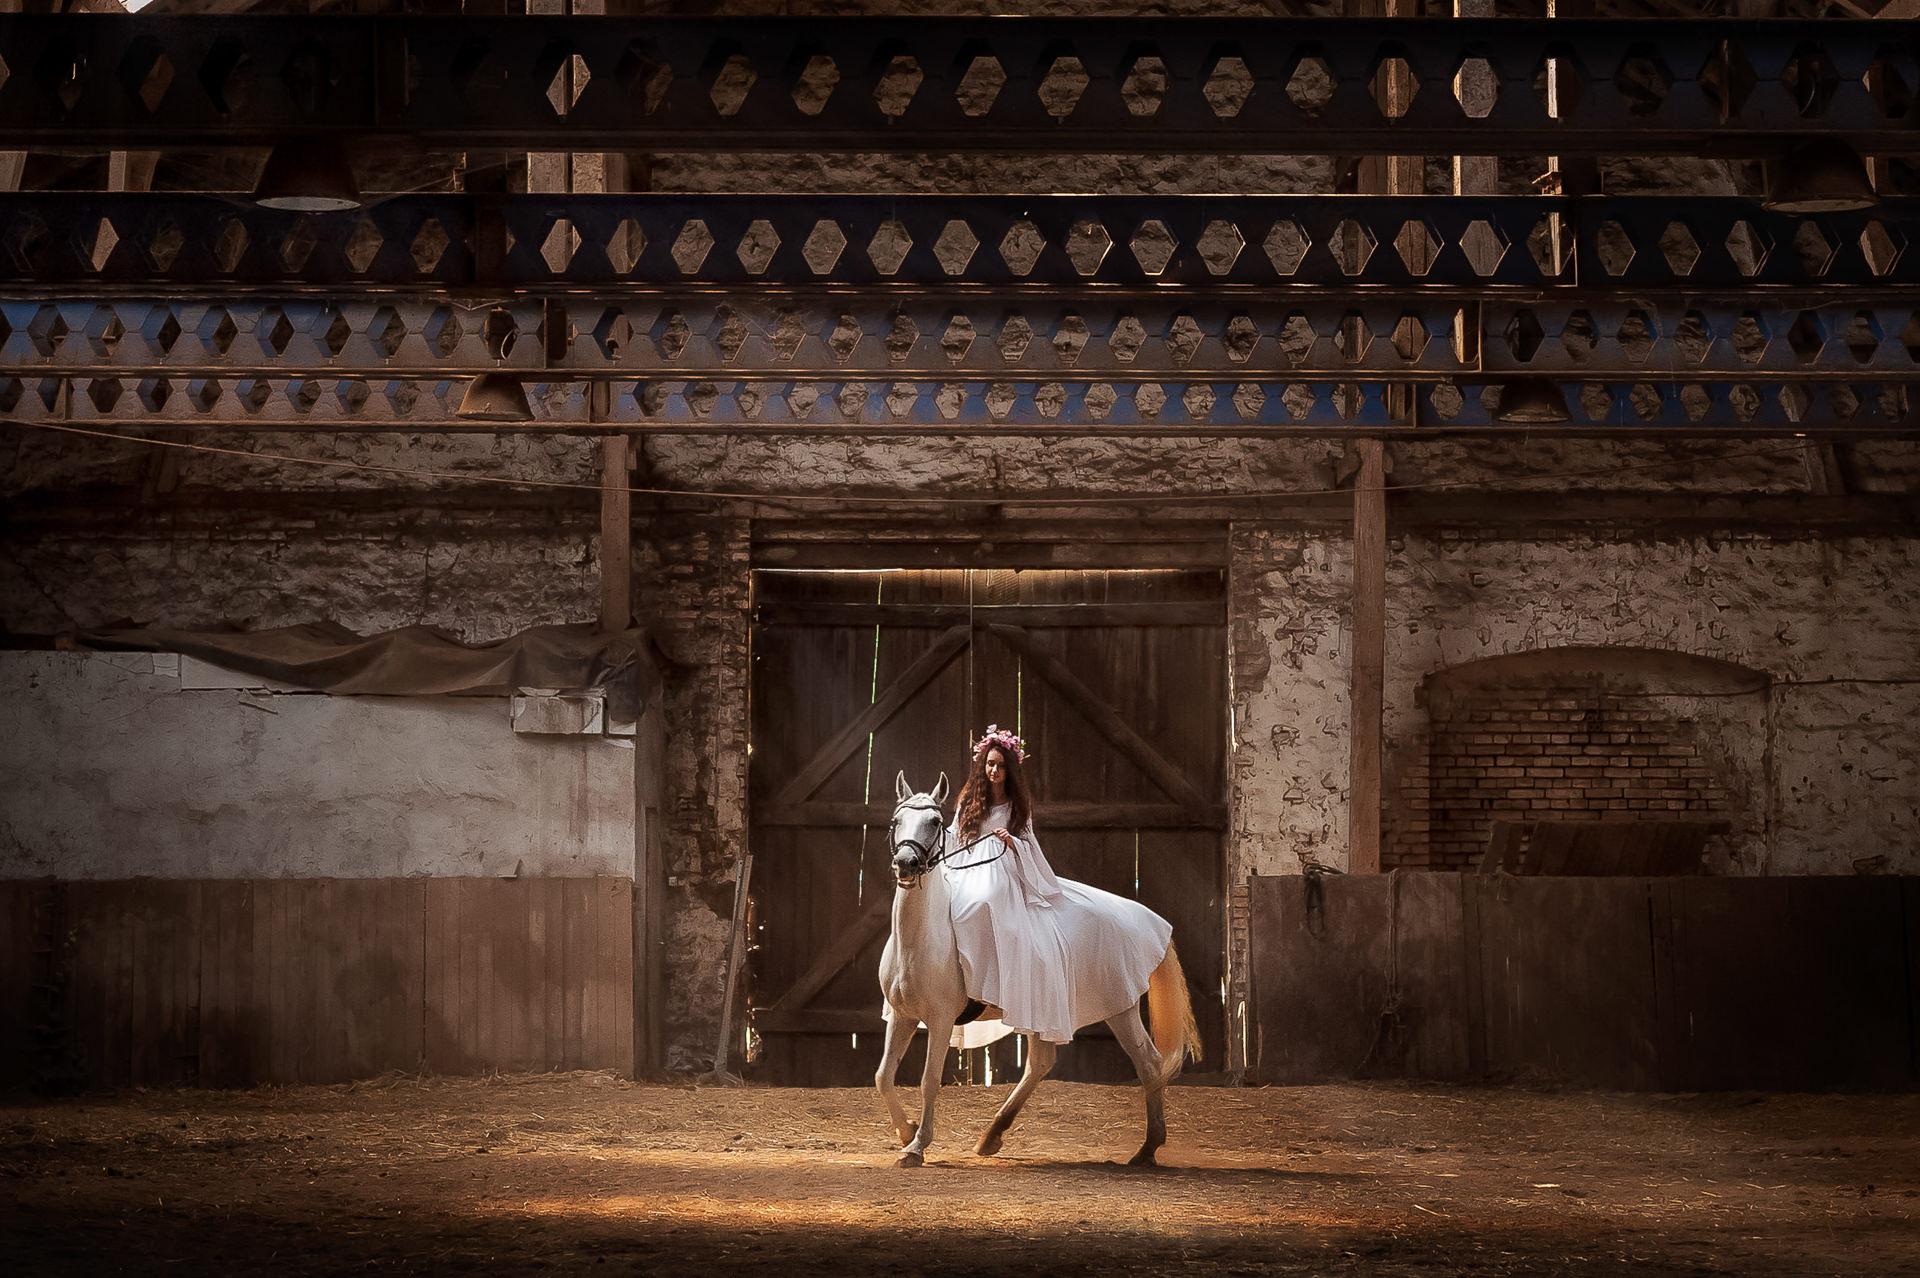 047-Sesja Ślubna na koniach Plener Ślubny na koniach